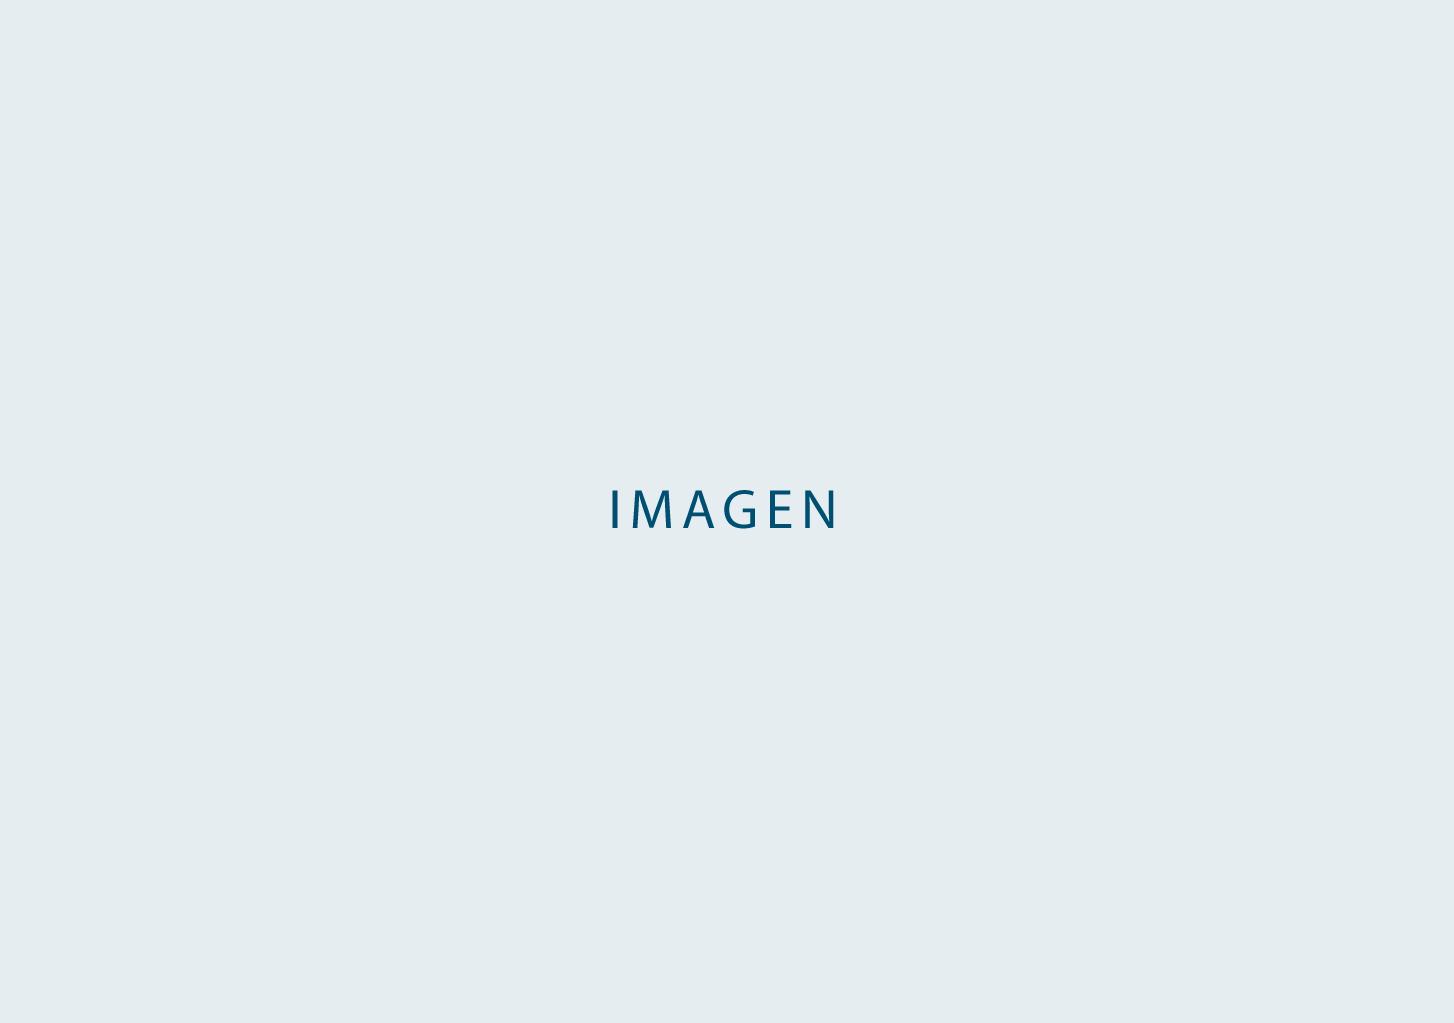 imagen-ejemplo-background